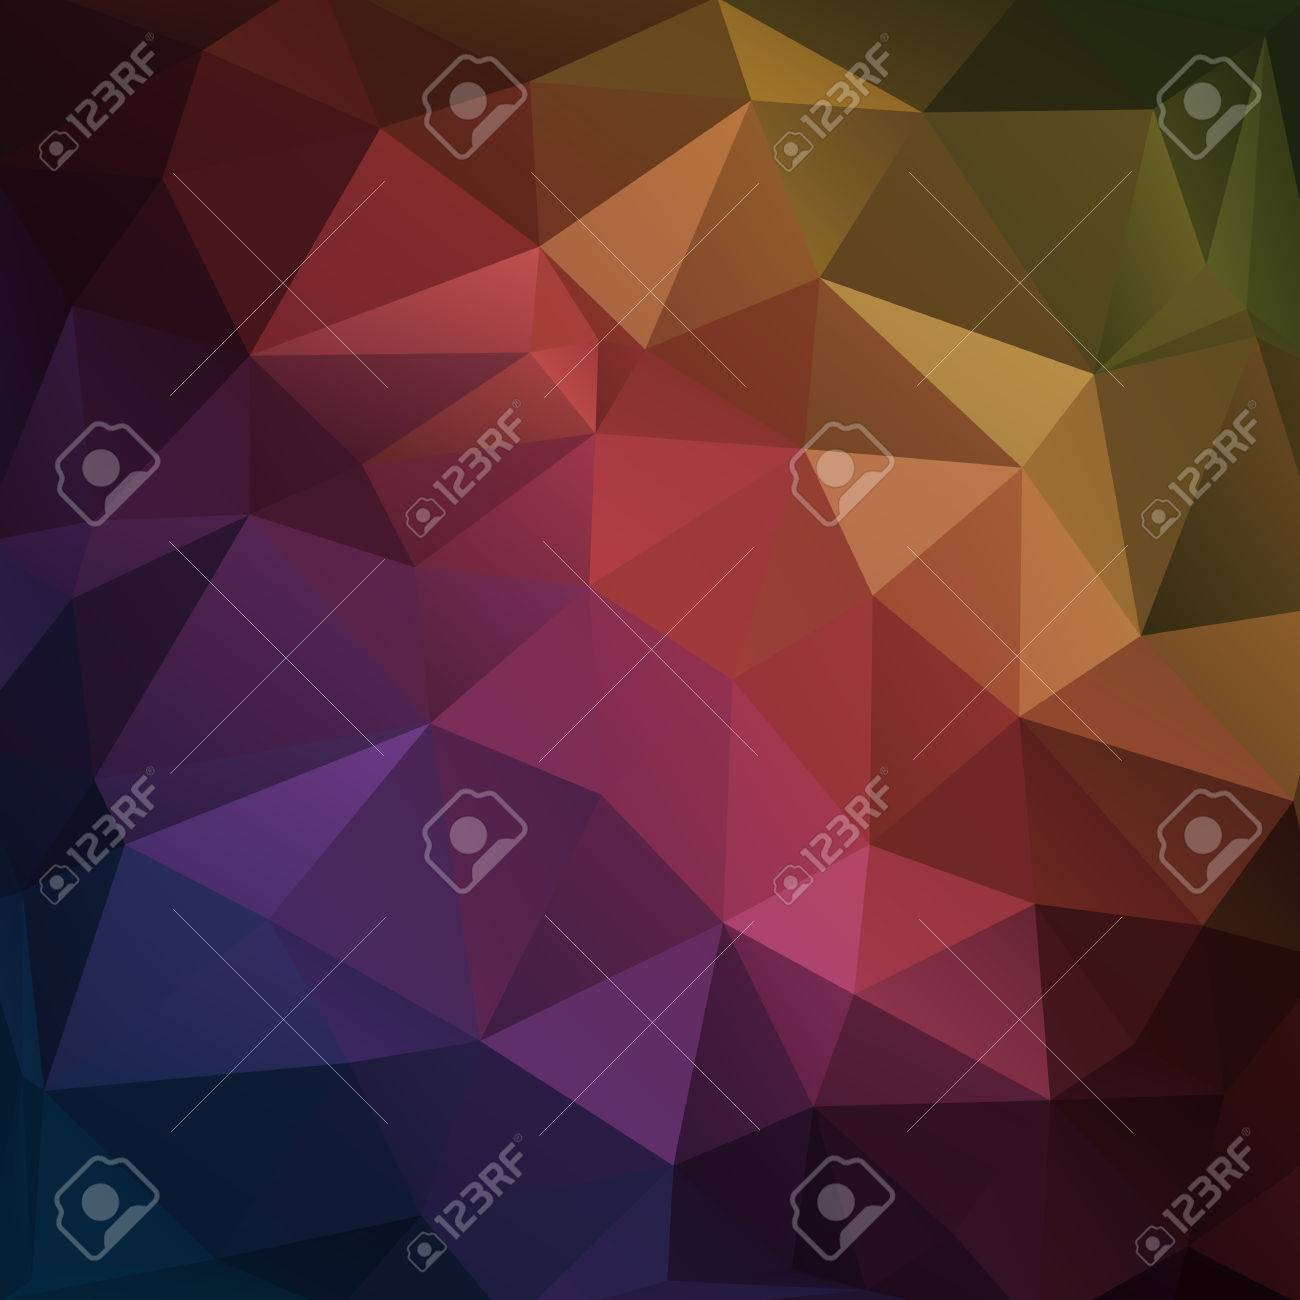 Dunkle Farben.Stock Photo